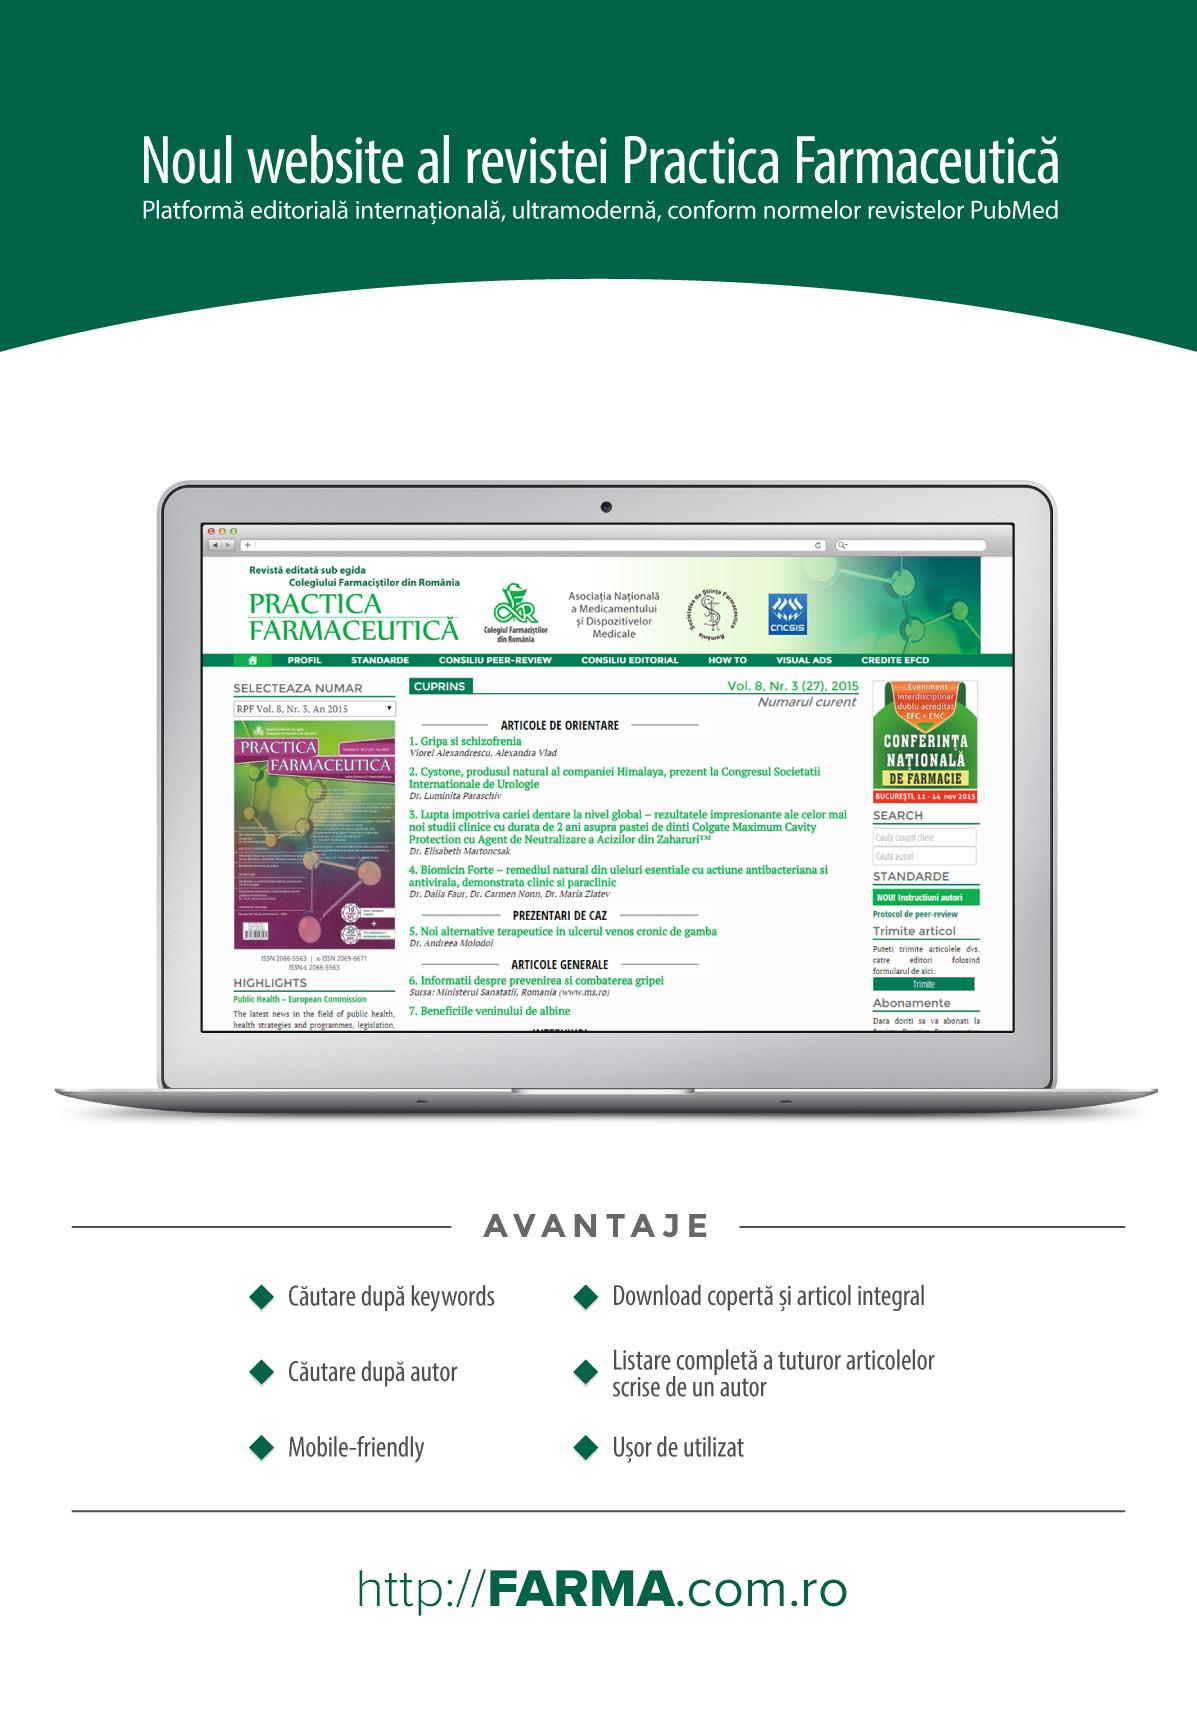 PRACTICA FARMACEUTICA - Romanian Journal of Pharmaceutical Practice